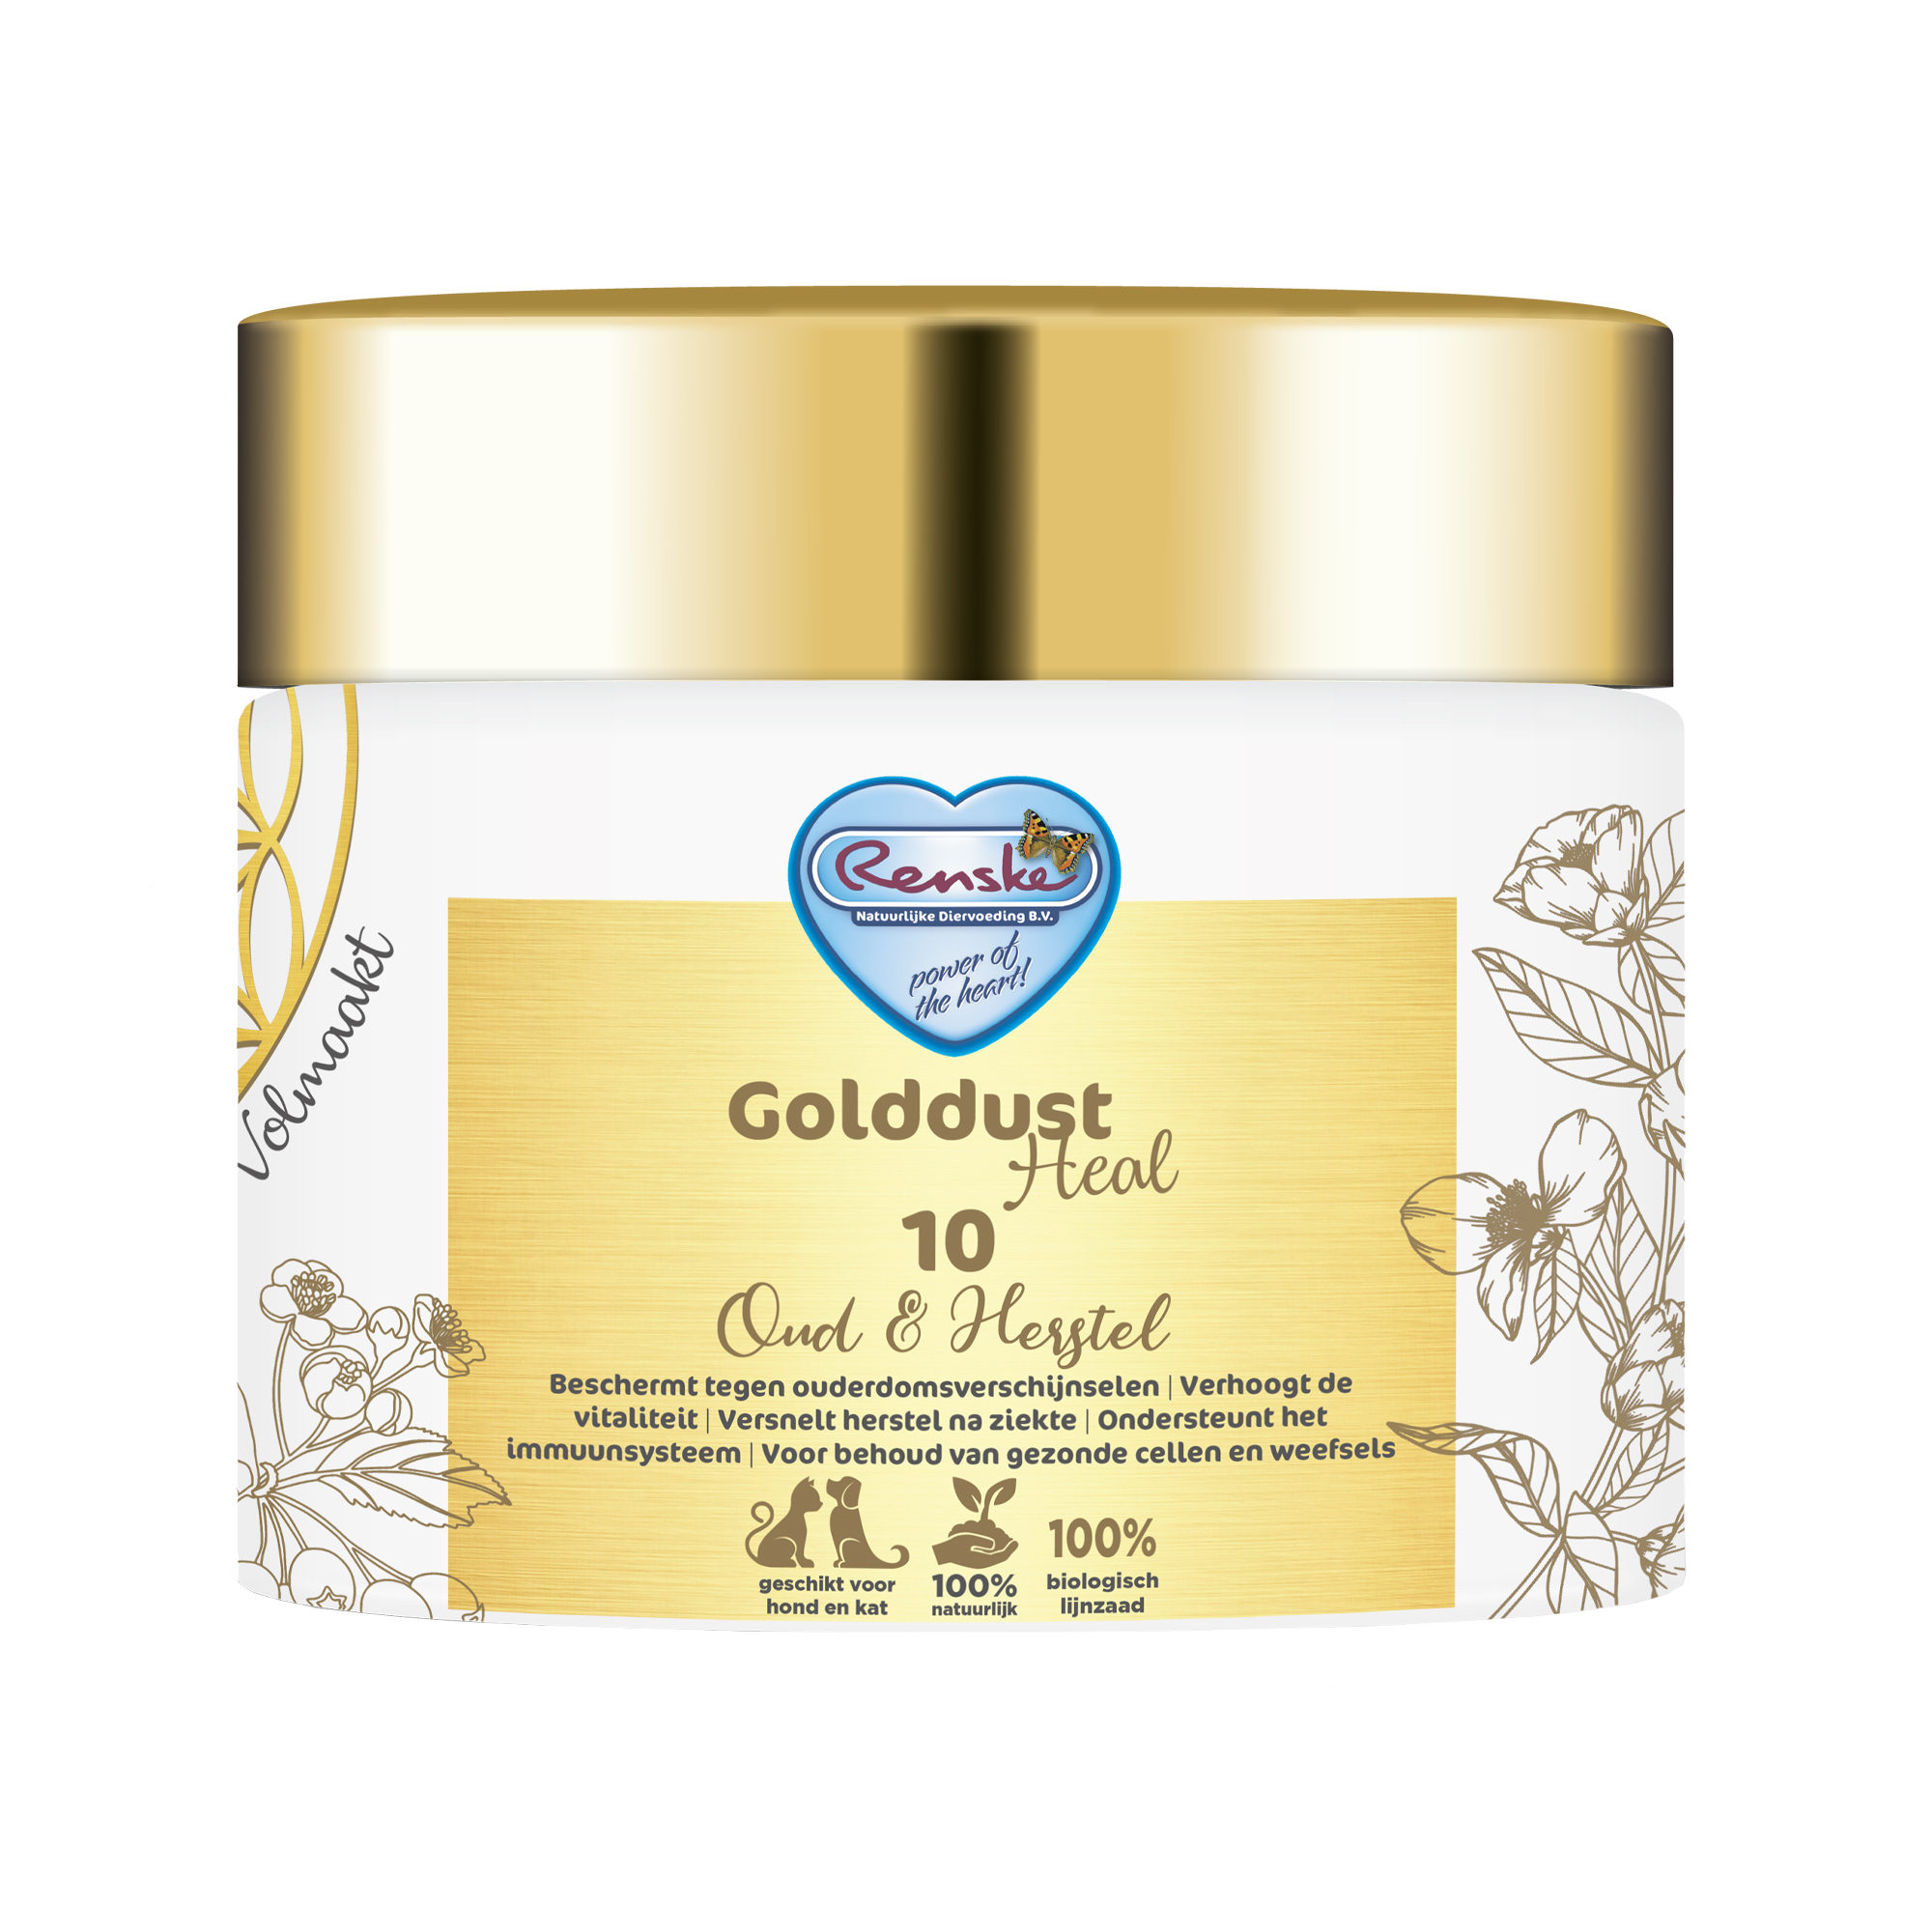 Renske Golddust Heal 10 - Âge et récupération